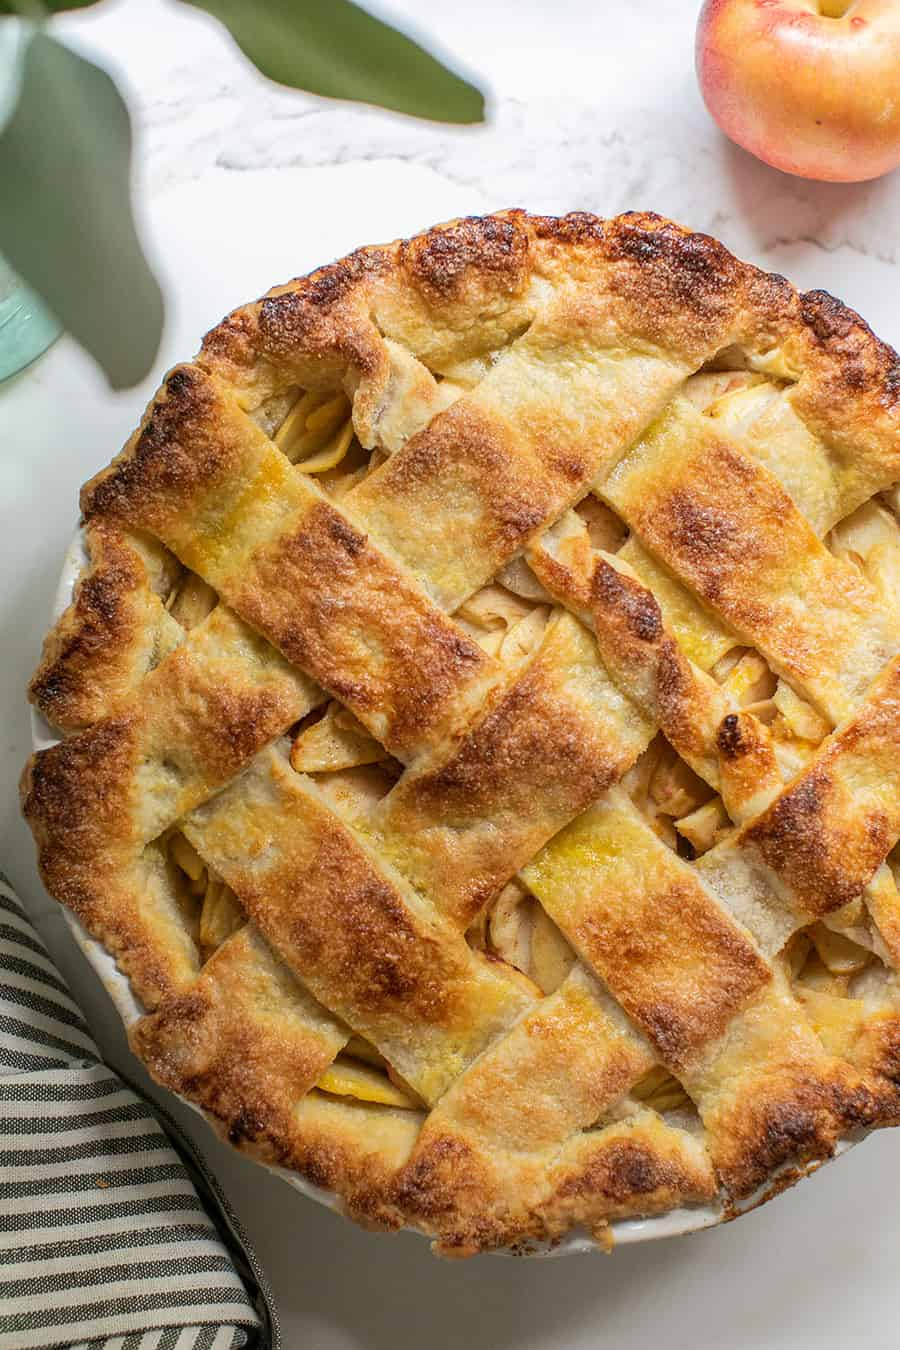 Close up of a golden brown homemade apple pie